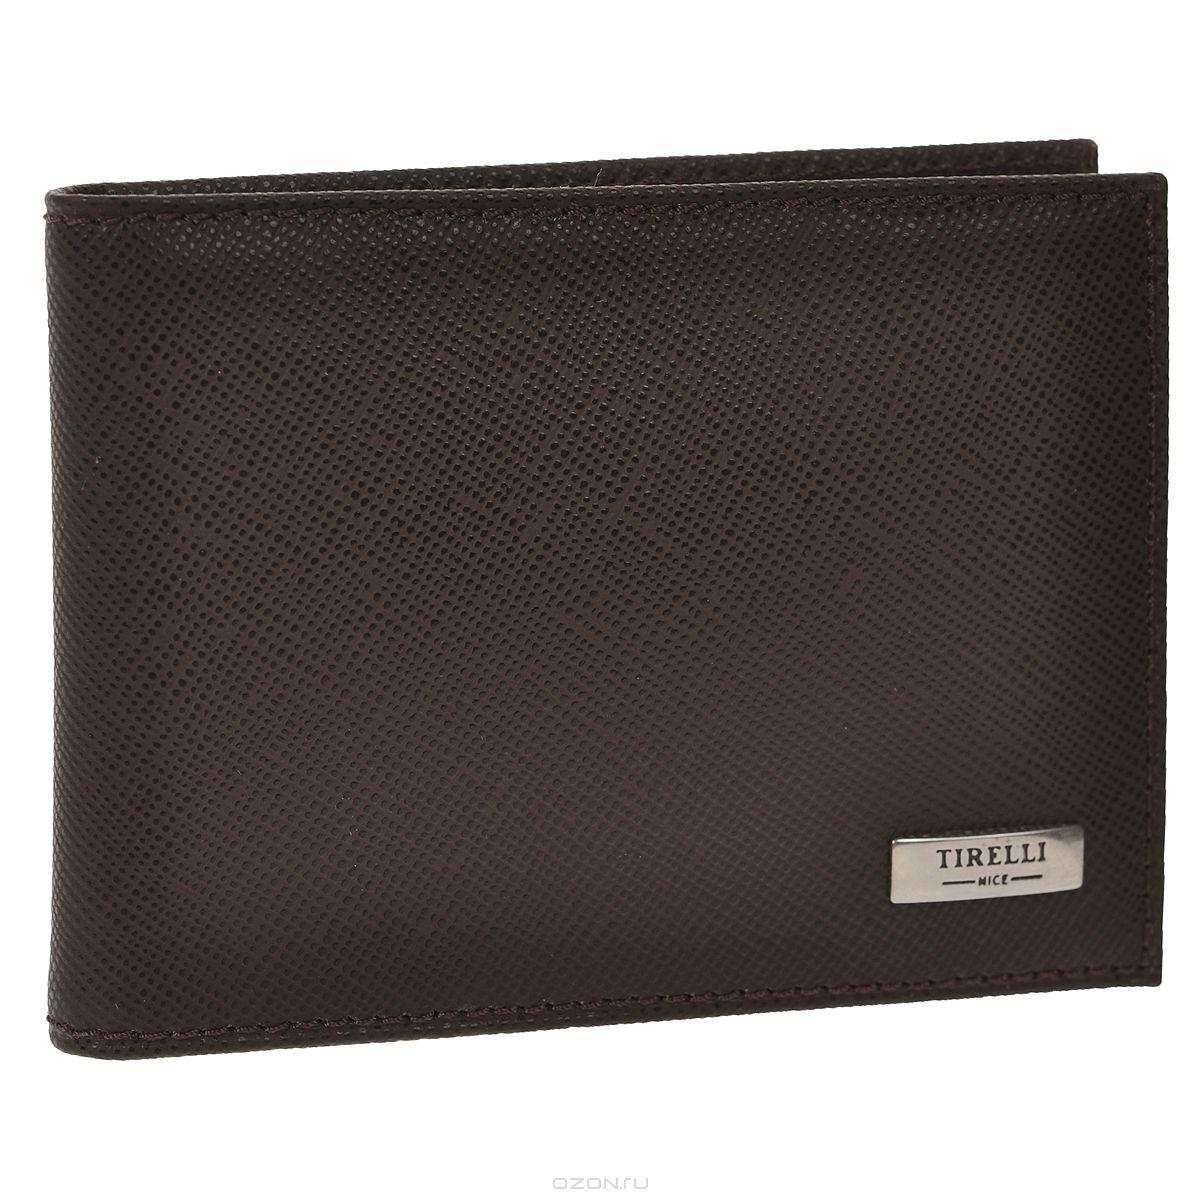 Футляр для карточек Tirelli Виктория, коричневый